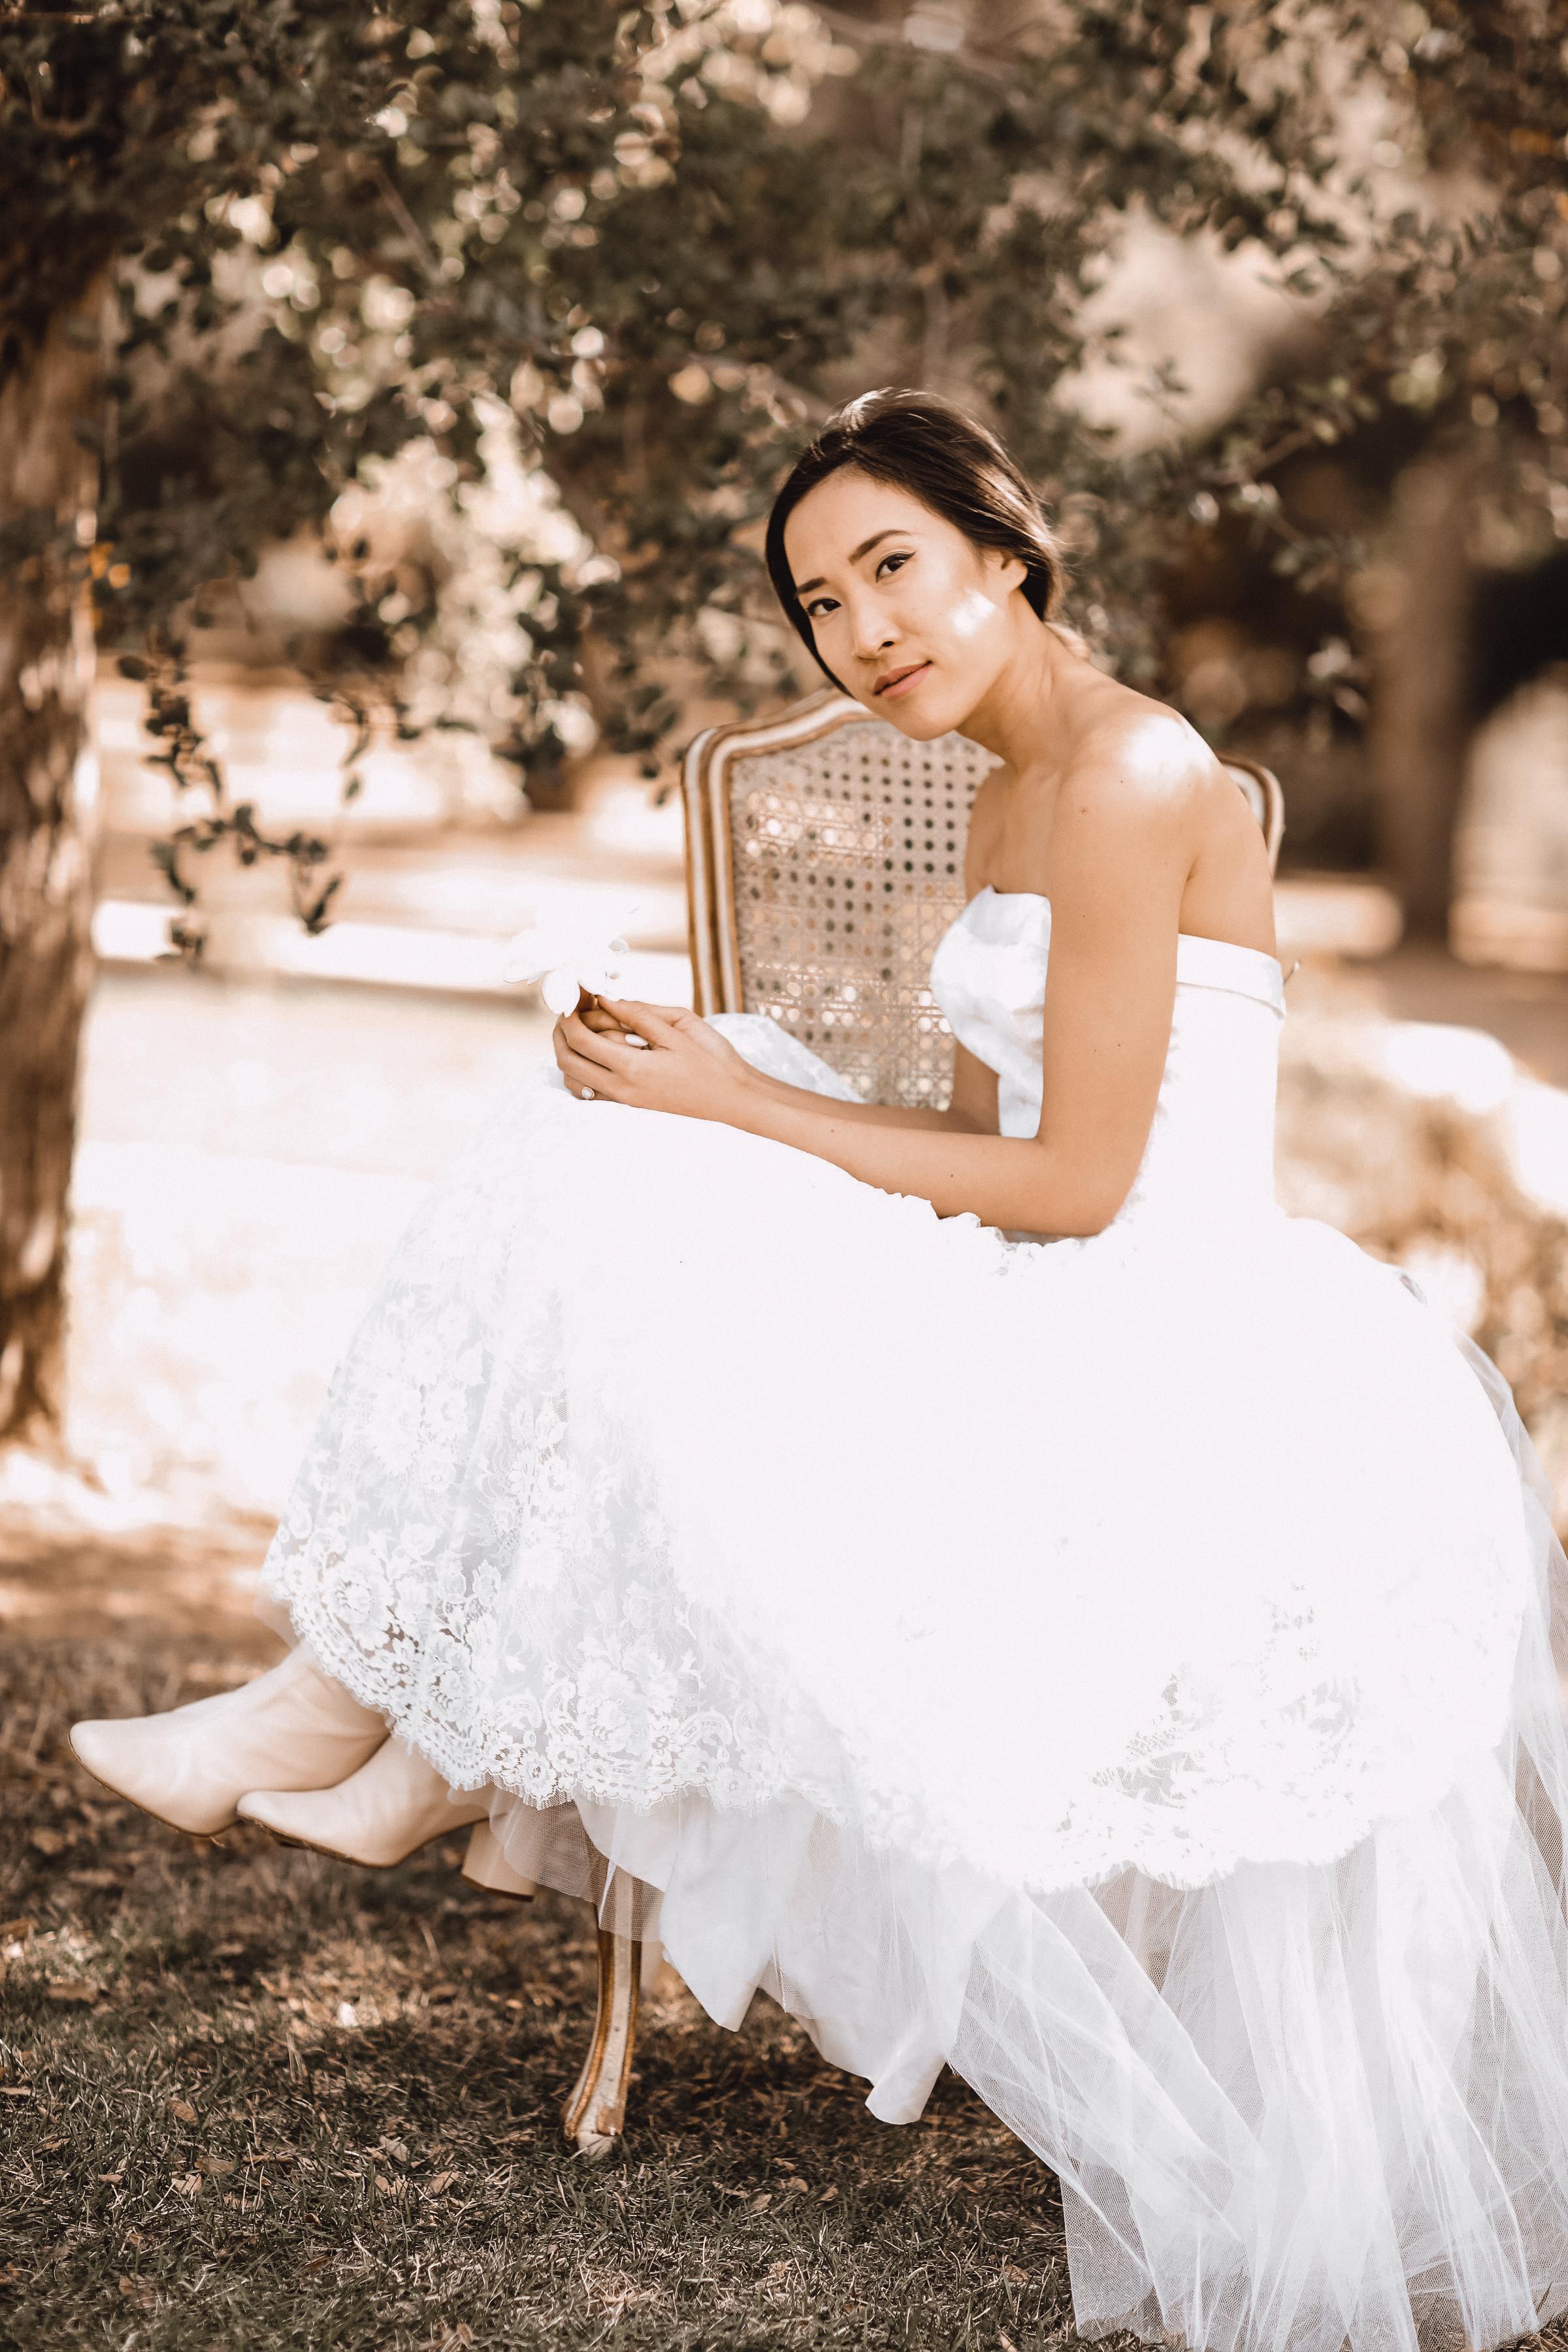 398fc7d0b196 Jean Jacket Over Wedding Dress